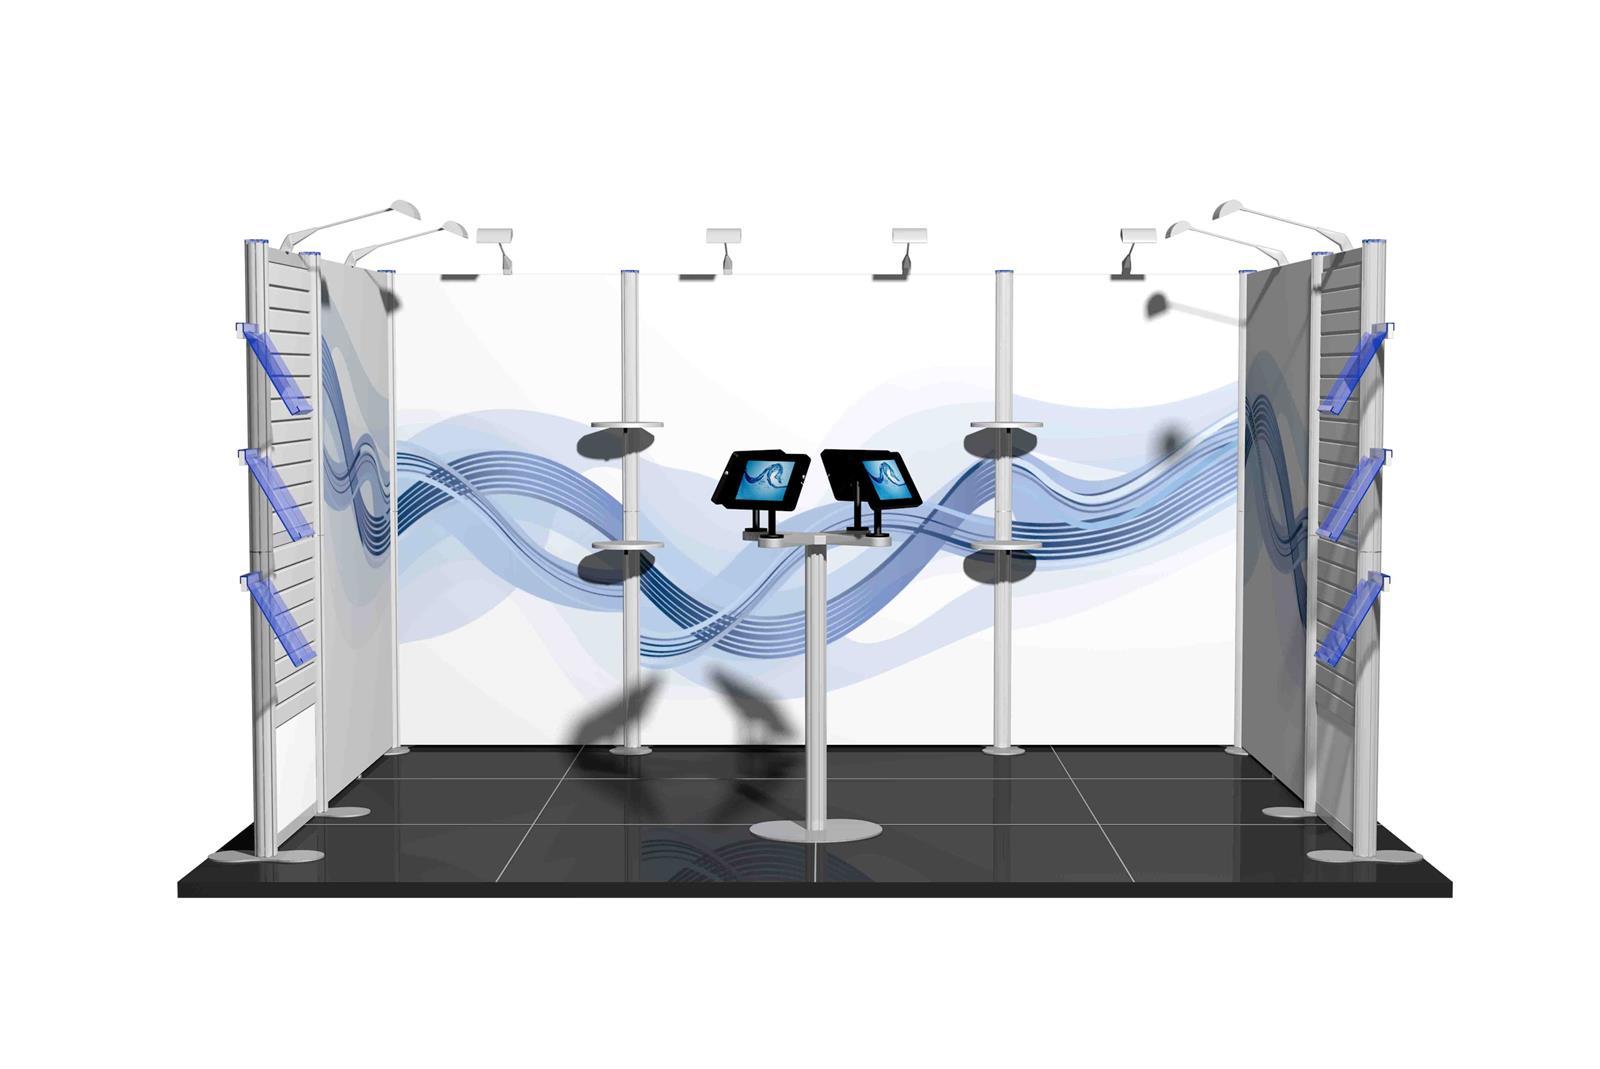 Centro 4m x 3m Modular Exhibition Stand - C4x3-1a